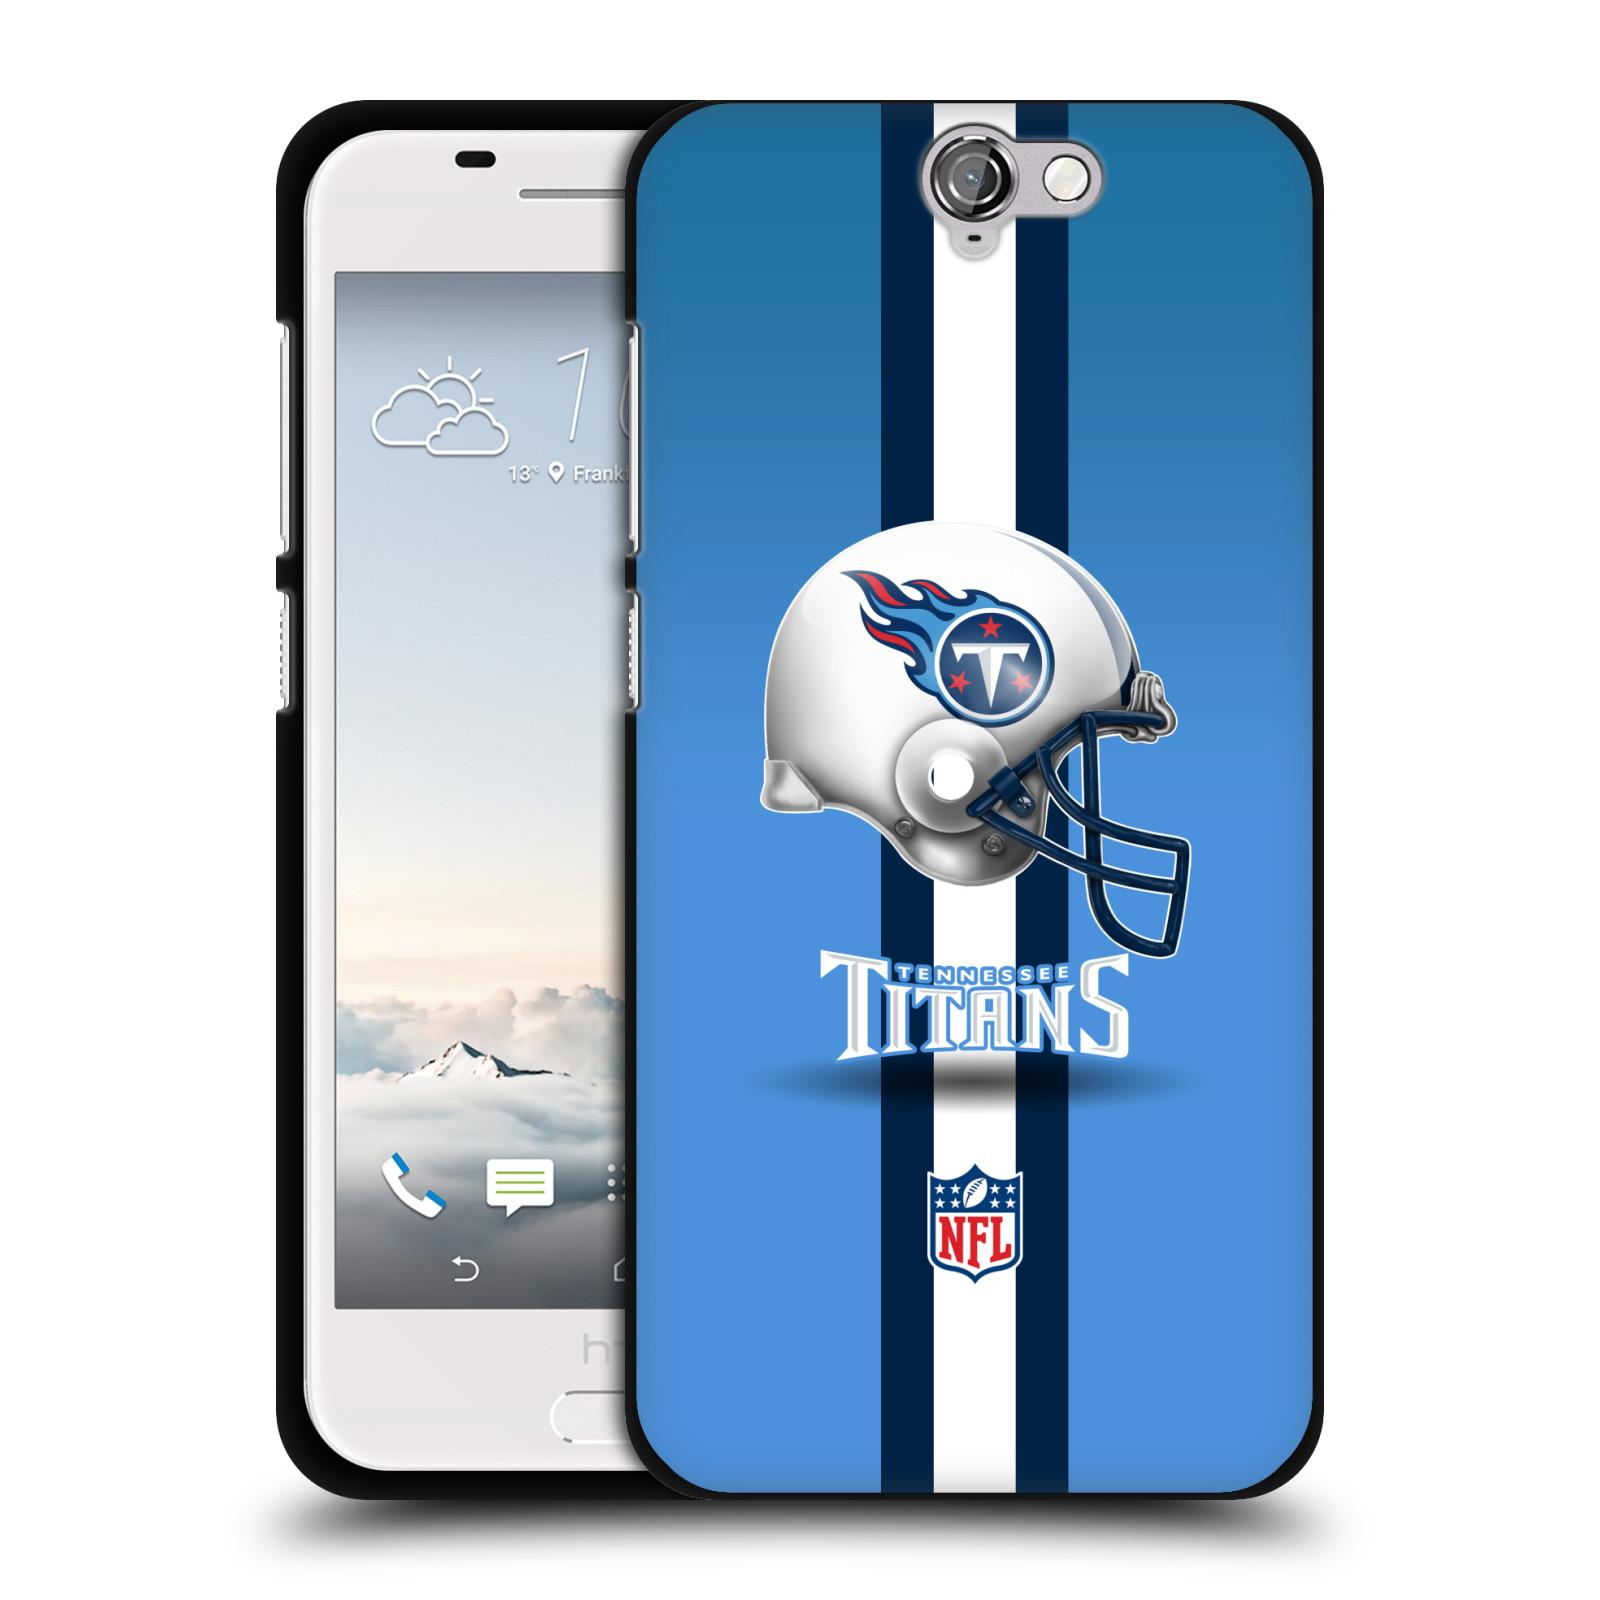 OFFICIAL-NFL-TENNESSEE-TITANS-LOGO-BLACK-SOFT-GEL-CASE-FOR-HTC-PHONES